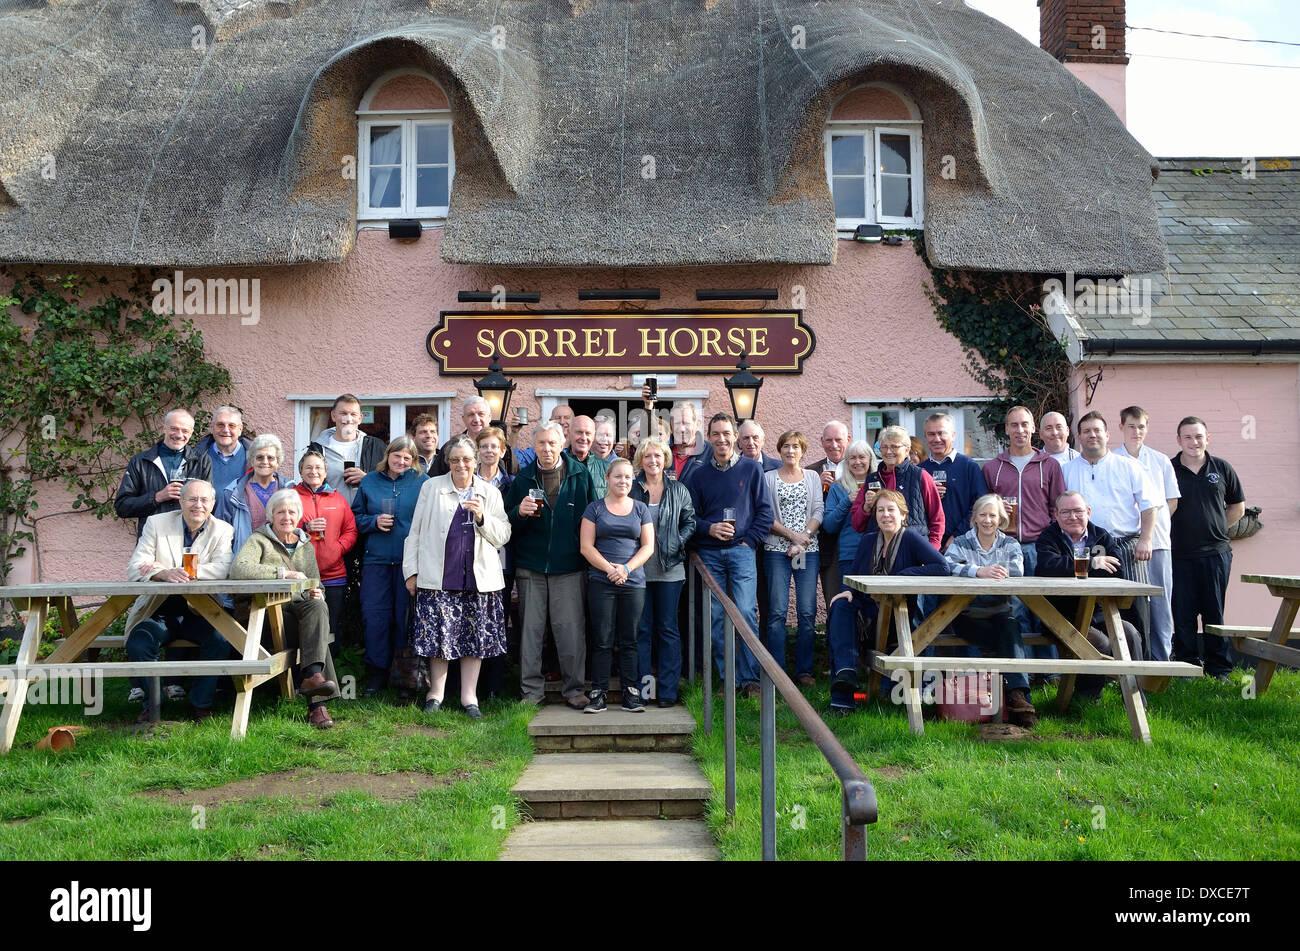 Sorrel Horse, staff and customers. Shottisham. Suffolk. - Stock Image